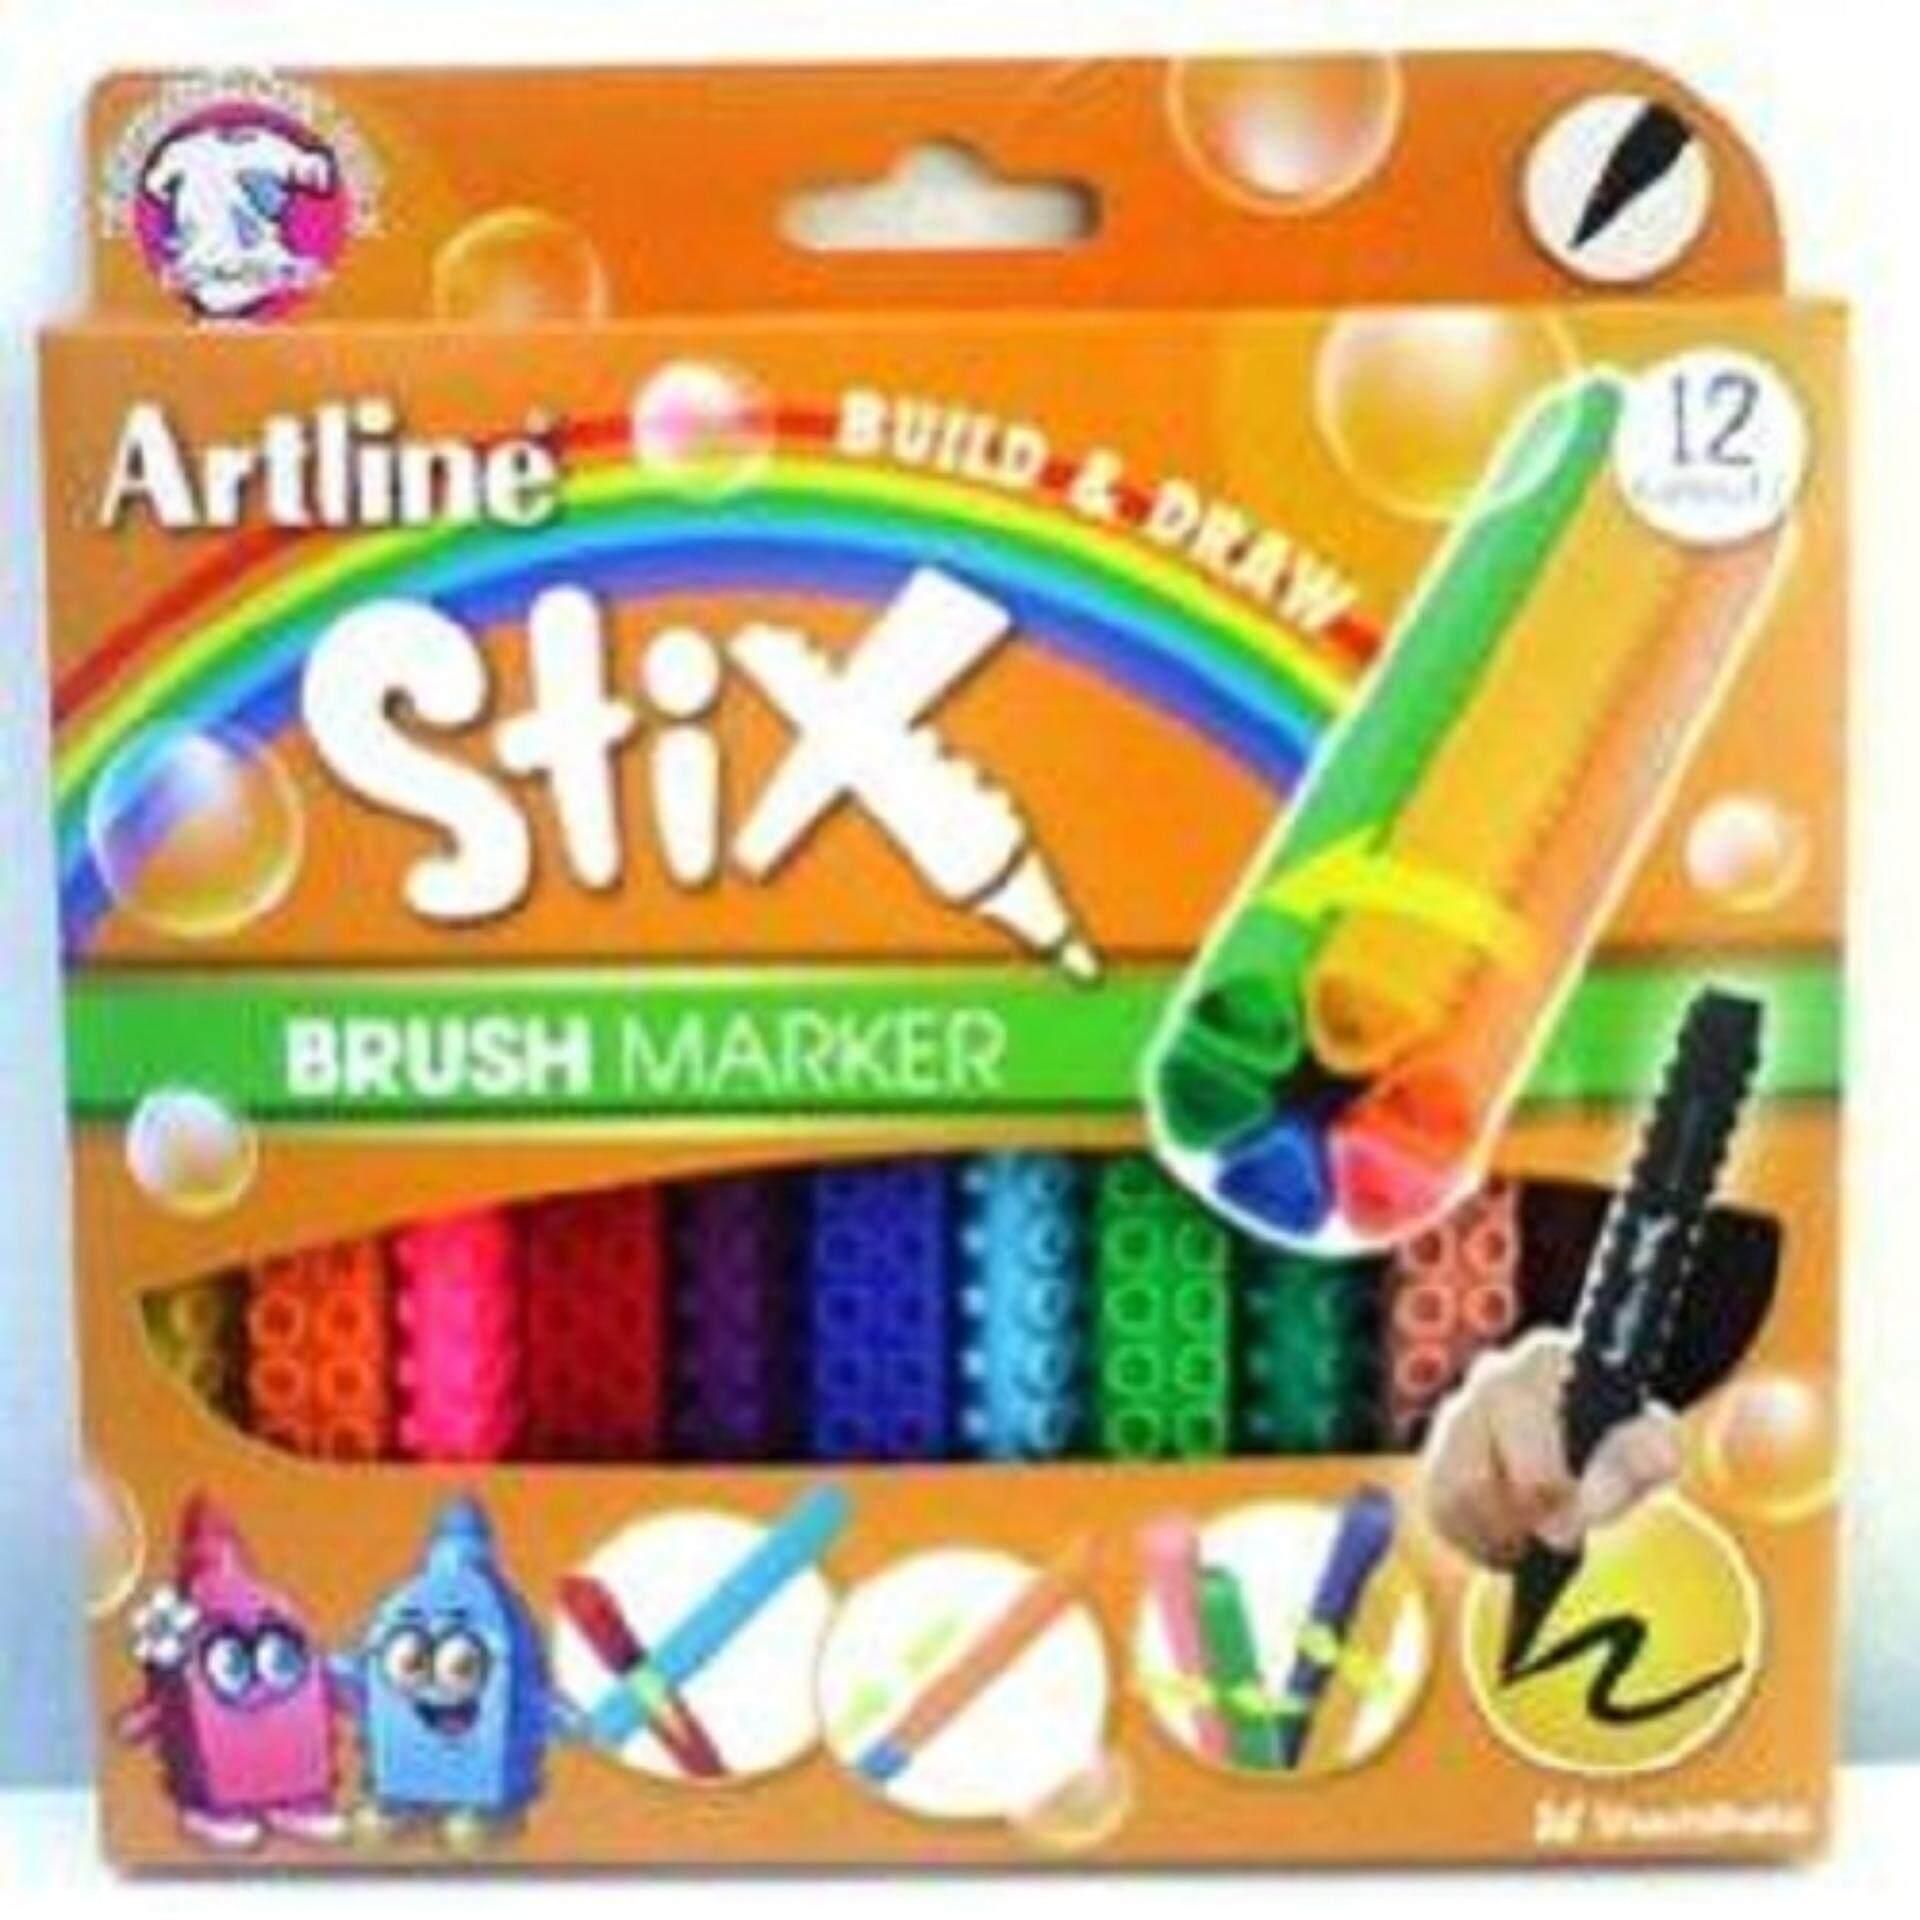 ARTLINE ETX-F STIX 12 BRUSH MARKER  ISBN: 4974052862311